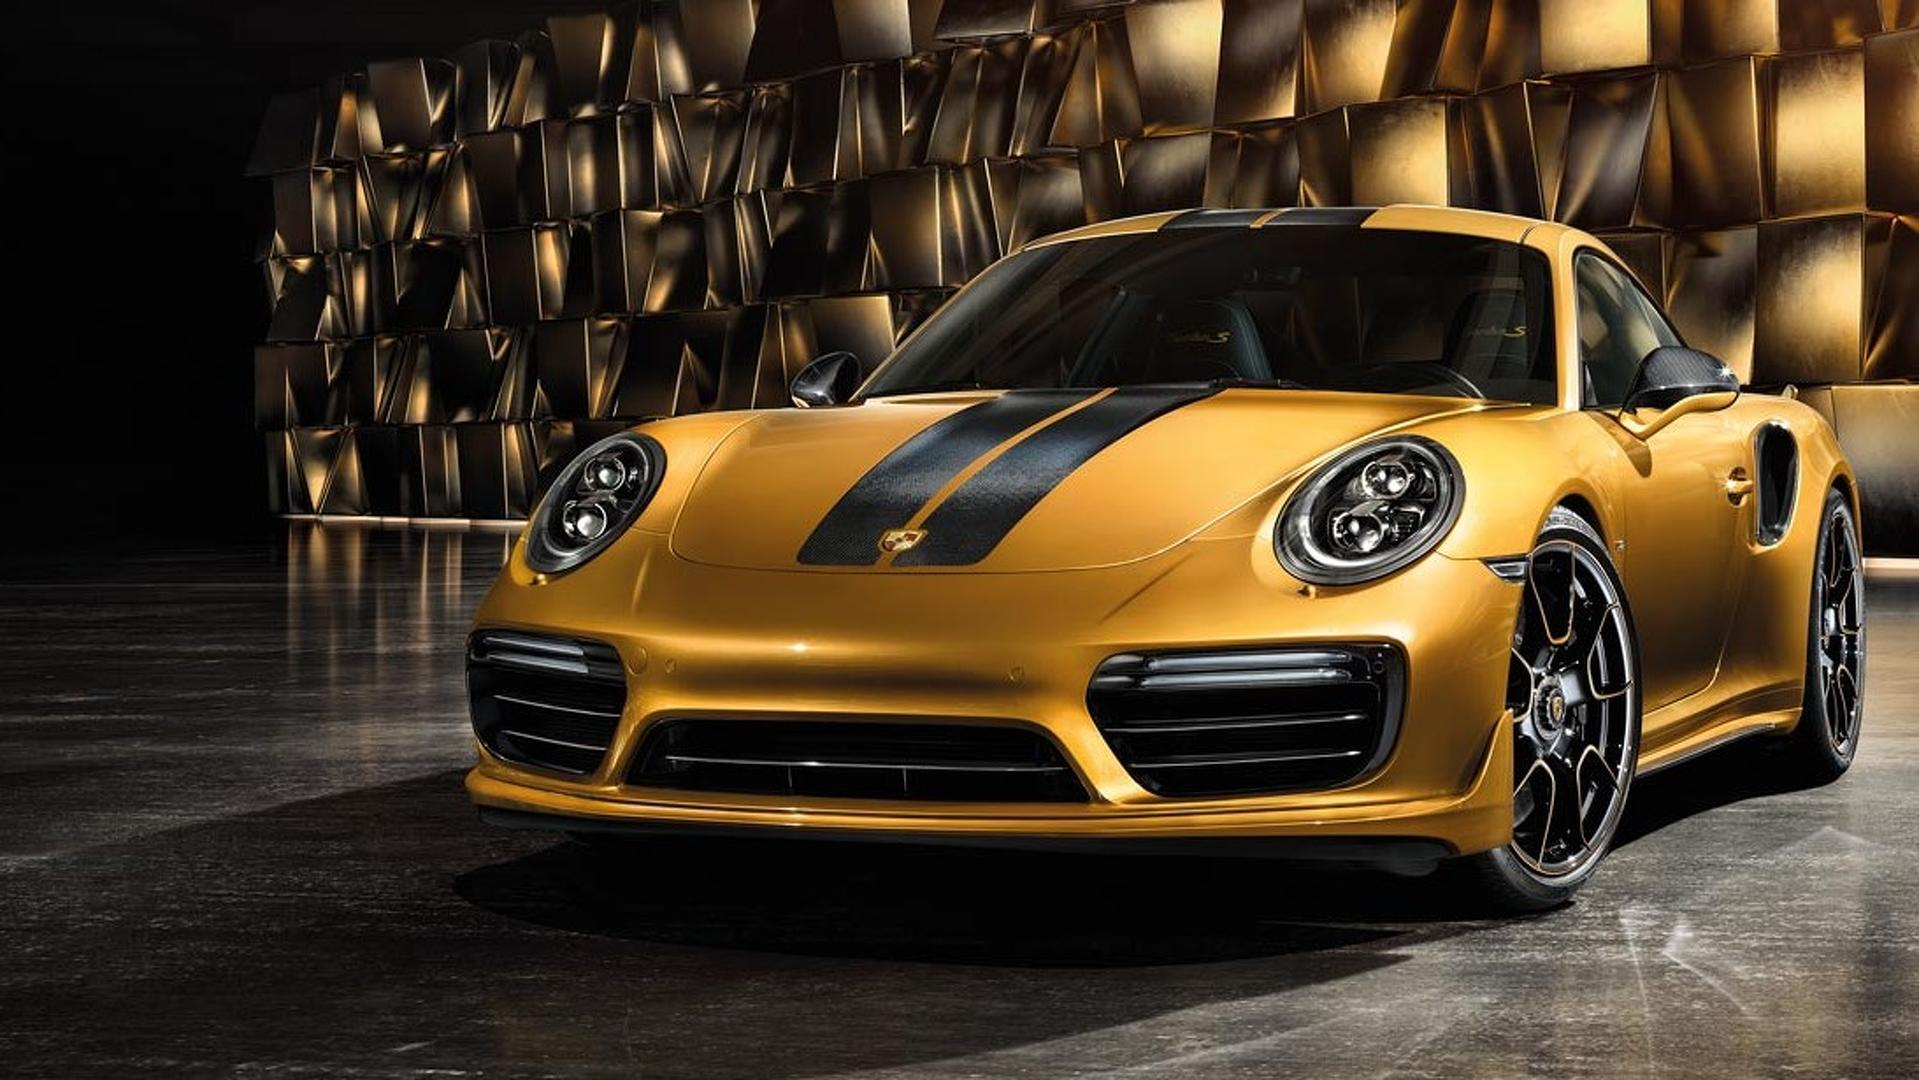 Porsche_911_Turbo_S_Exclusive_Series_04